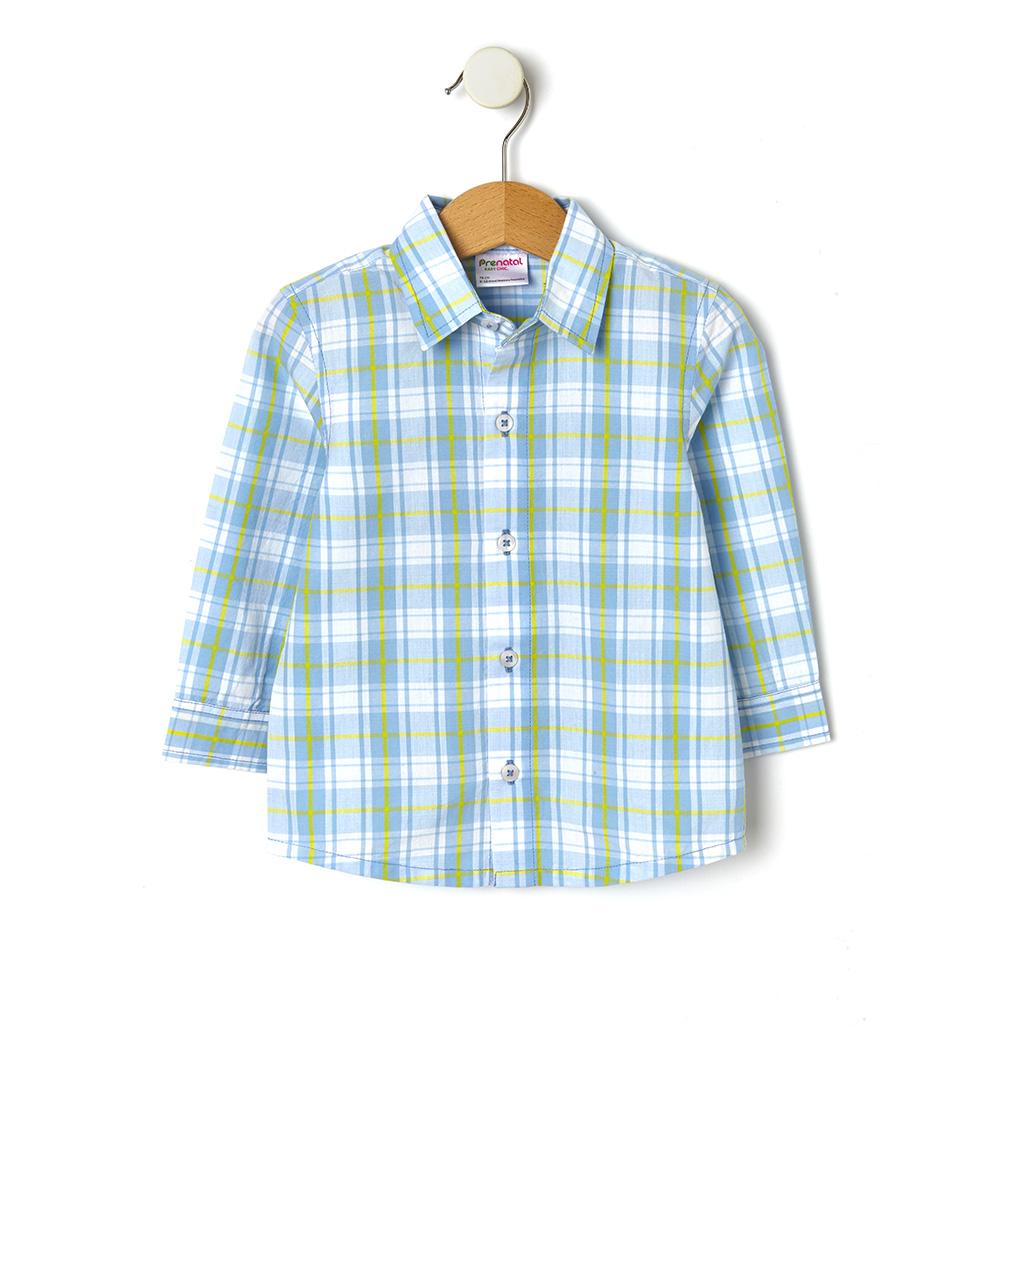 Camisa escocesa - Prénatal